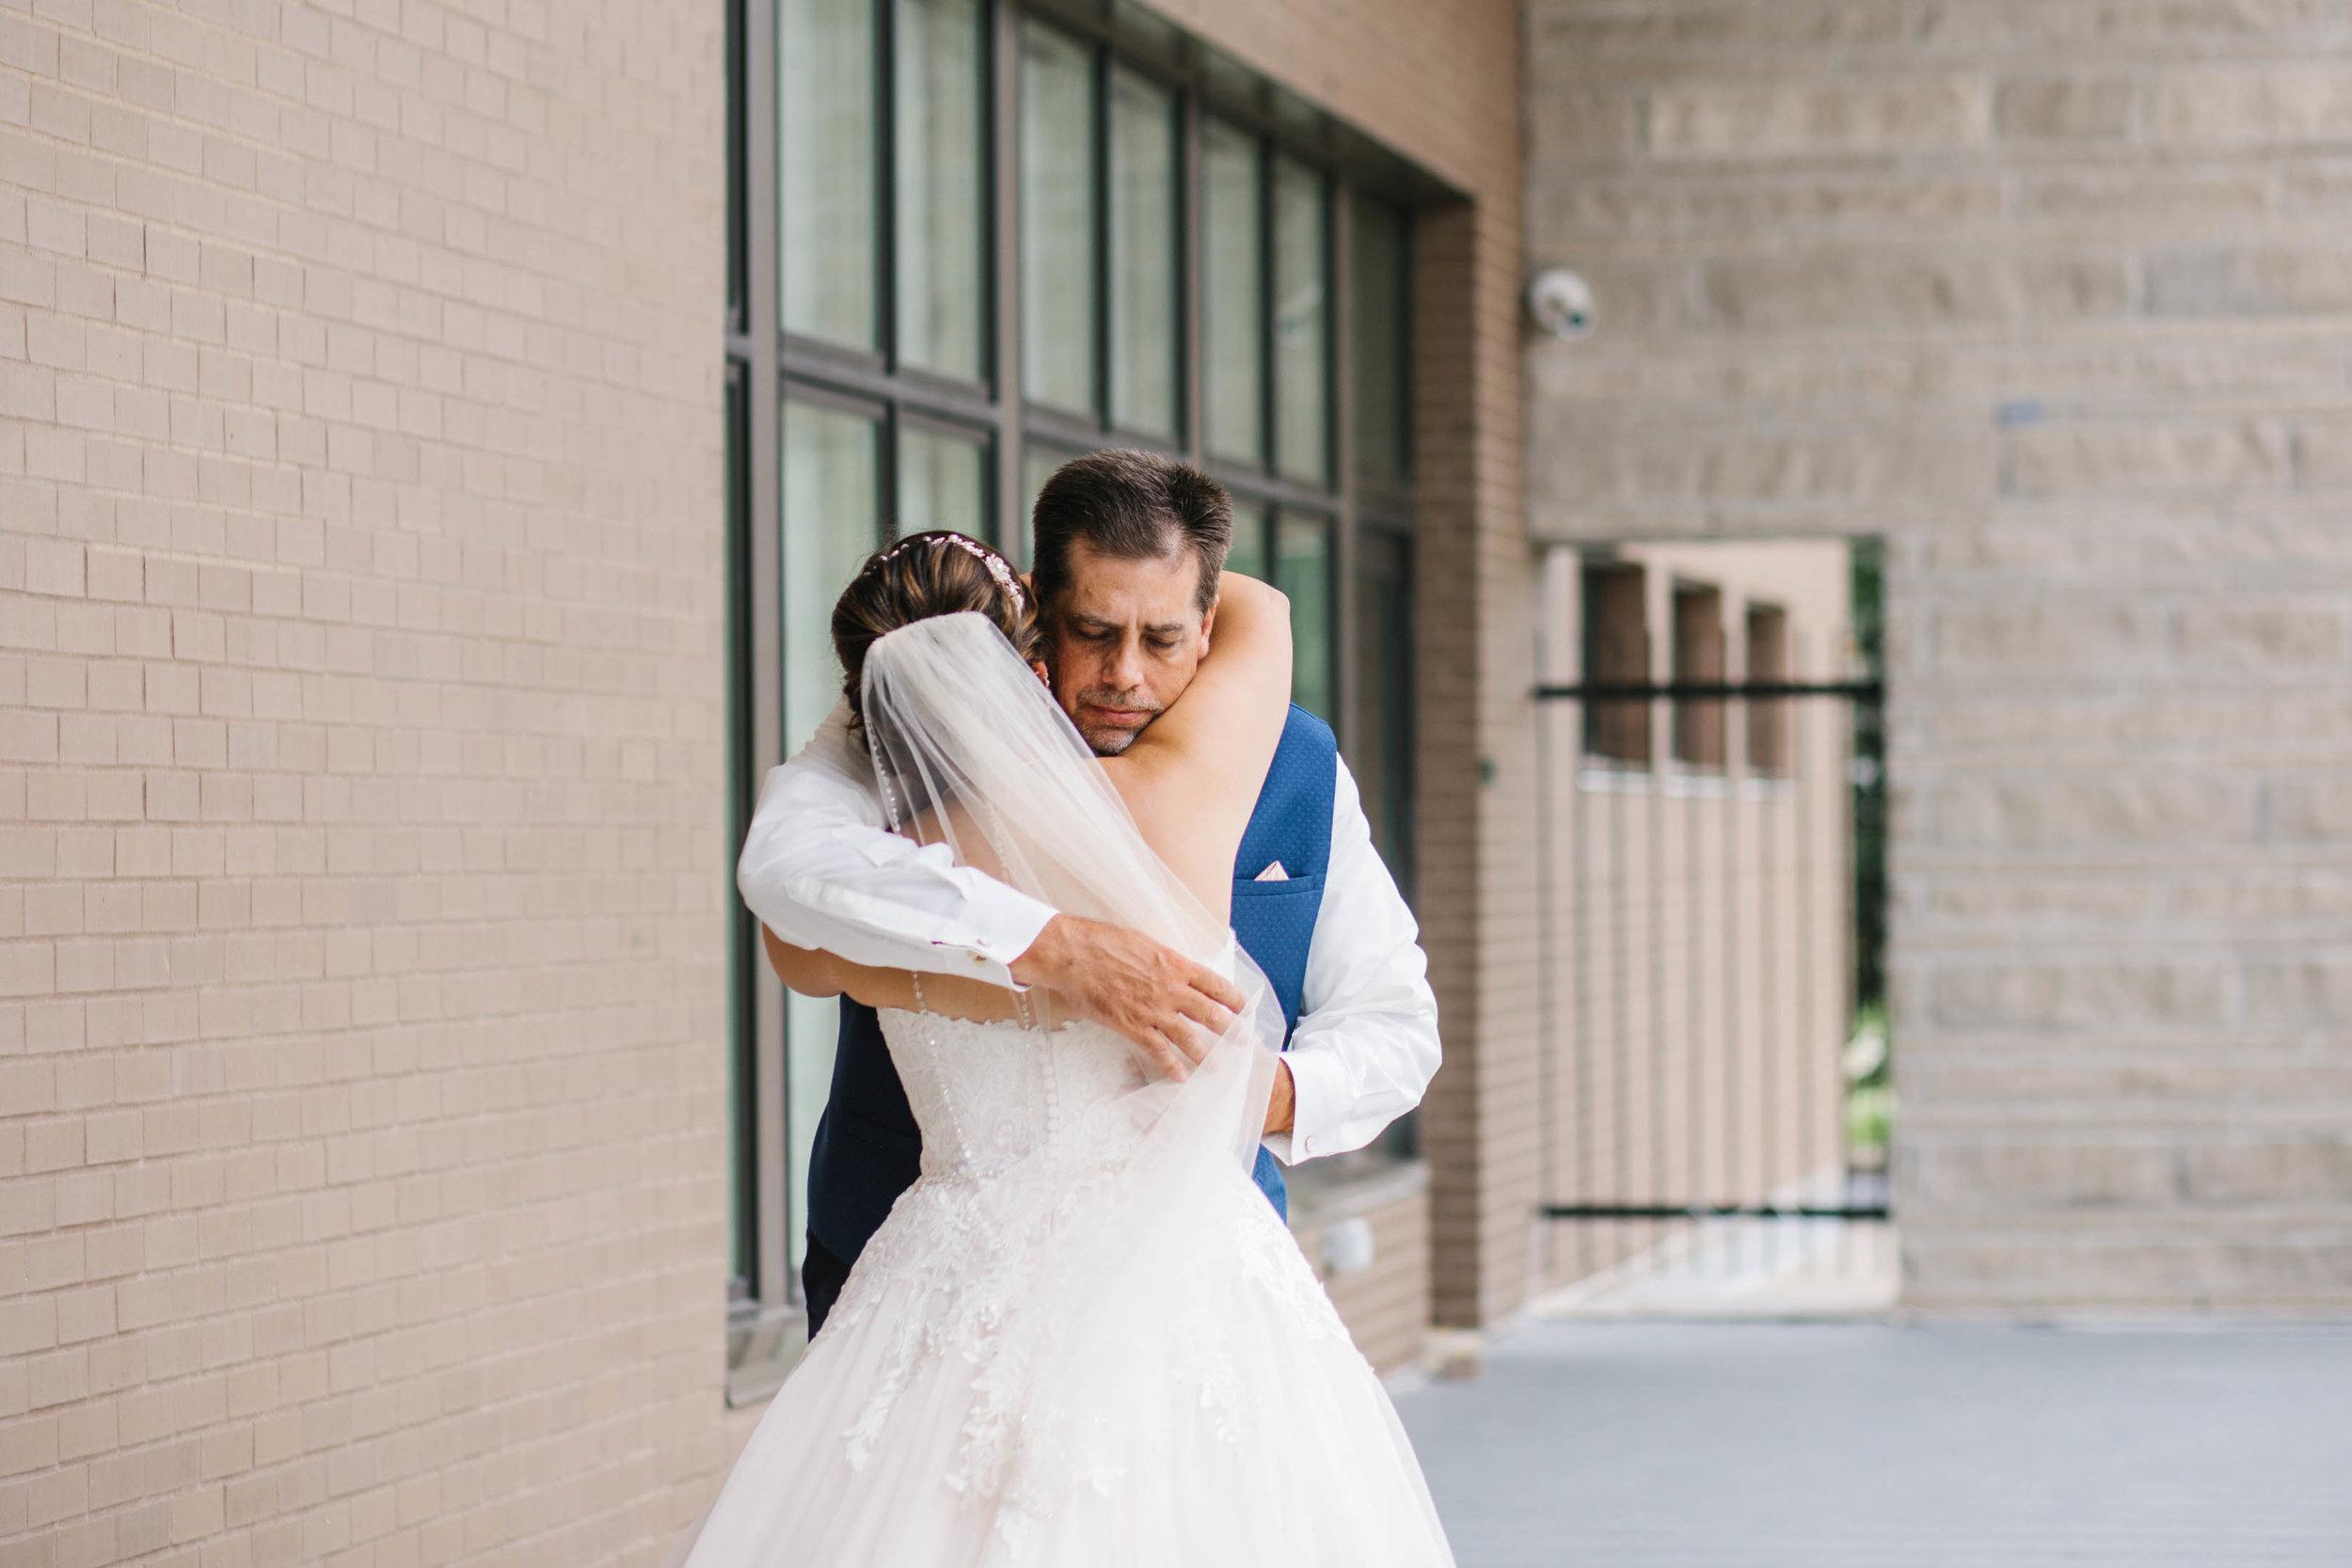 cedar falls iowa weddings first look with dad bride